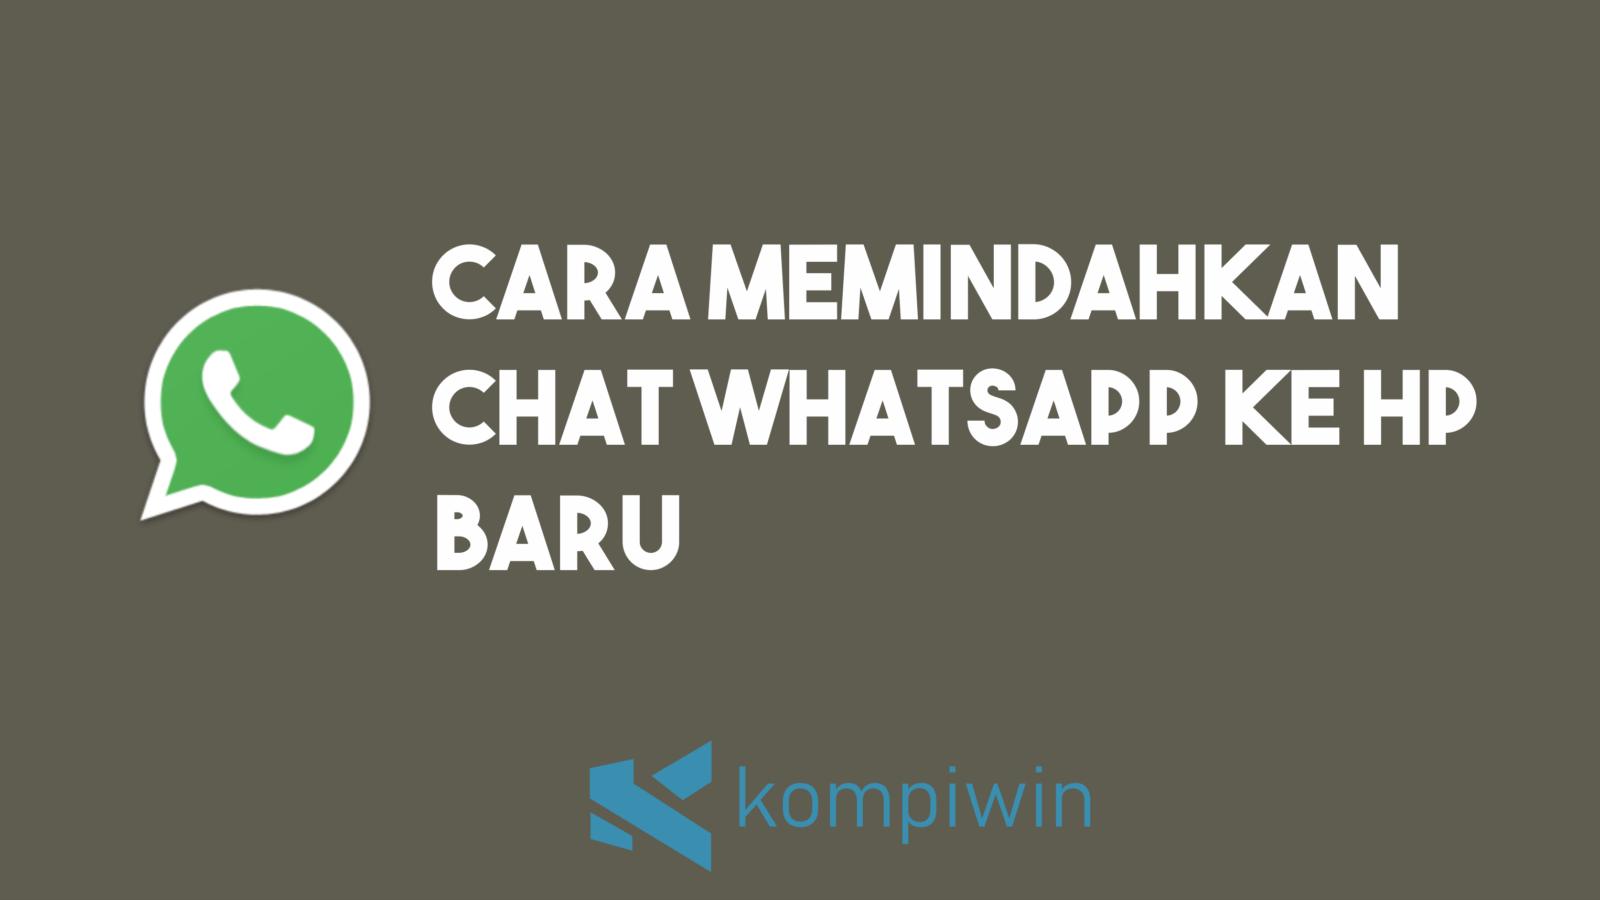 Cara Memindahkan Chat WhatsApp Ke HP Baru 4